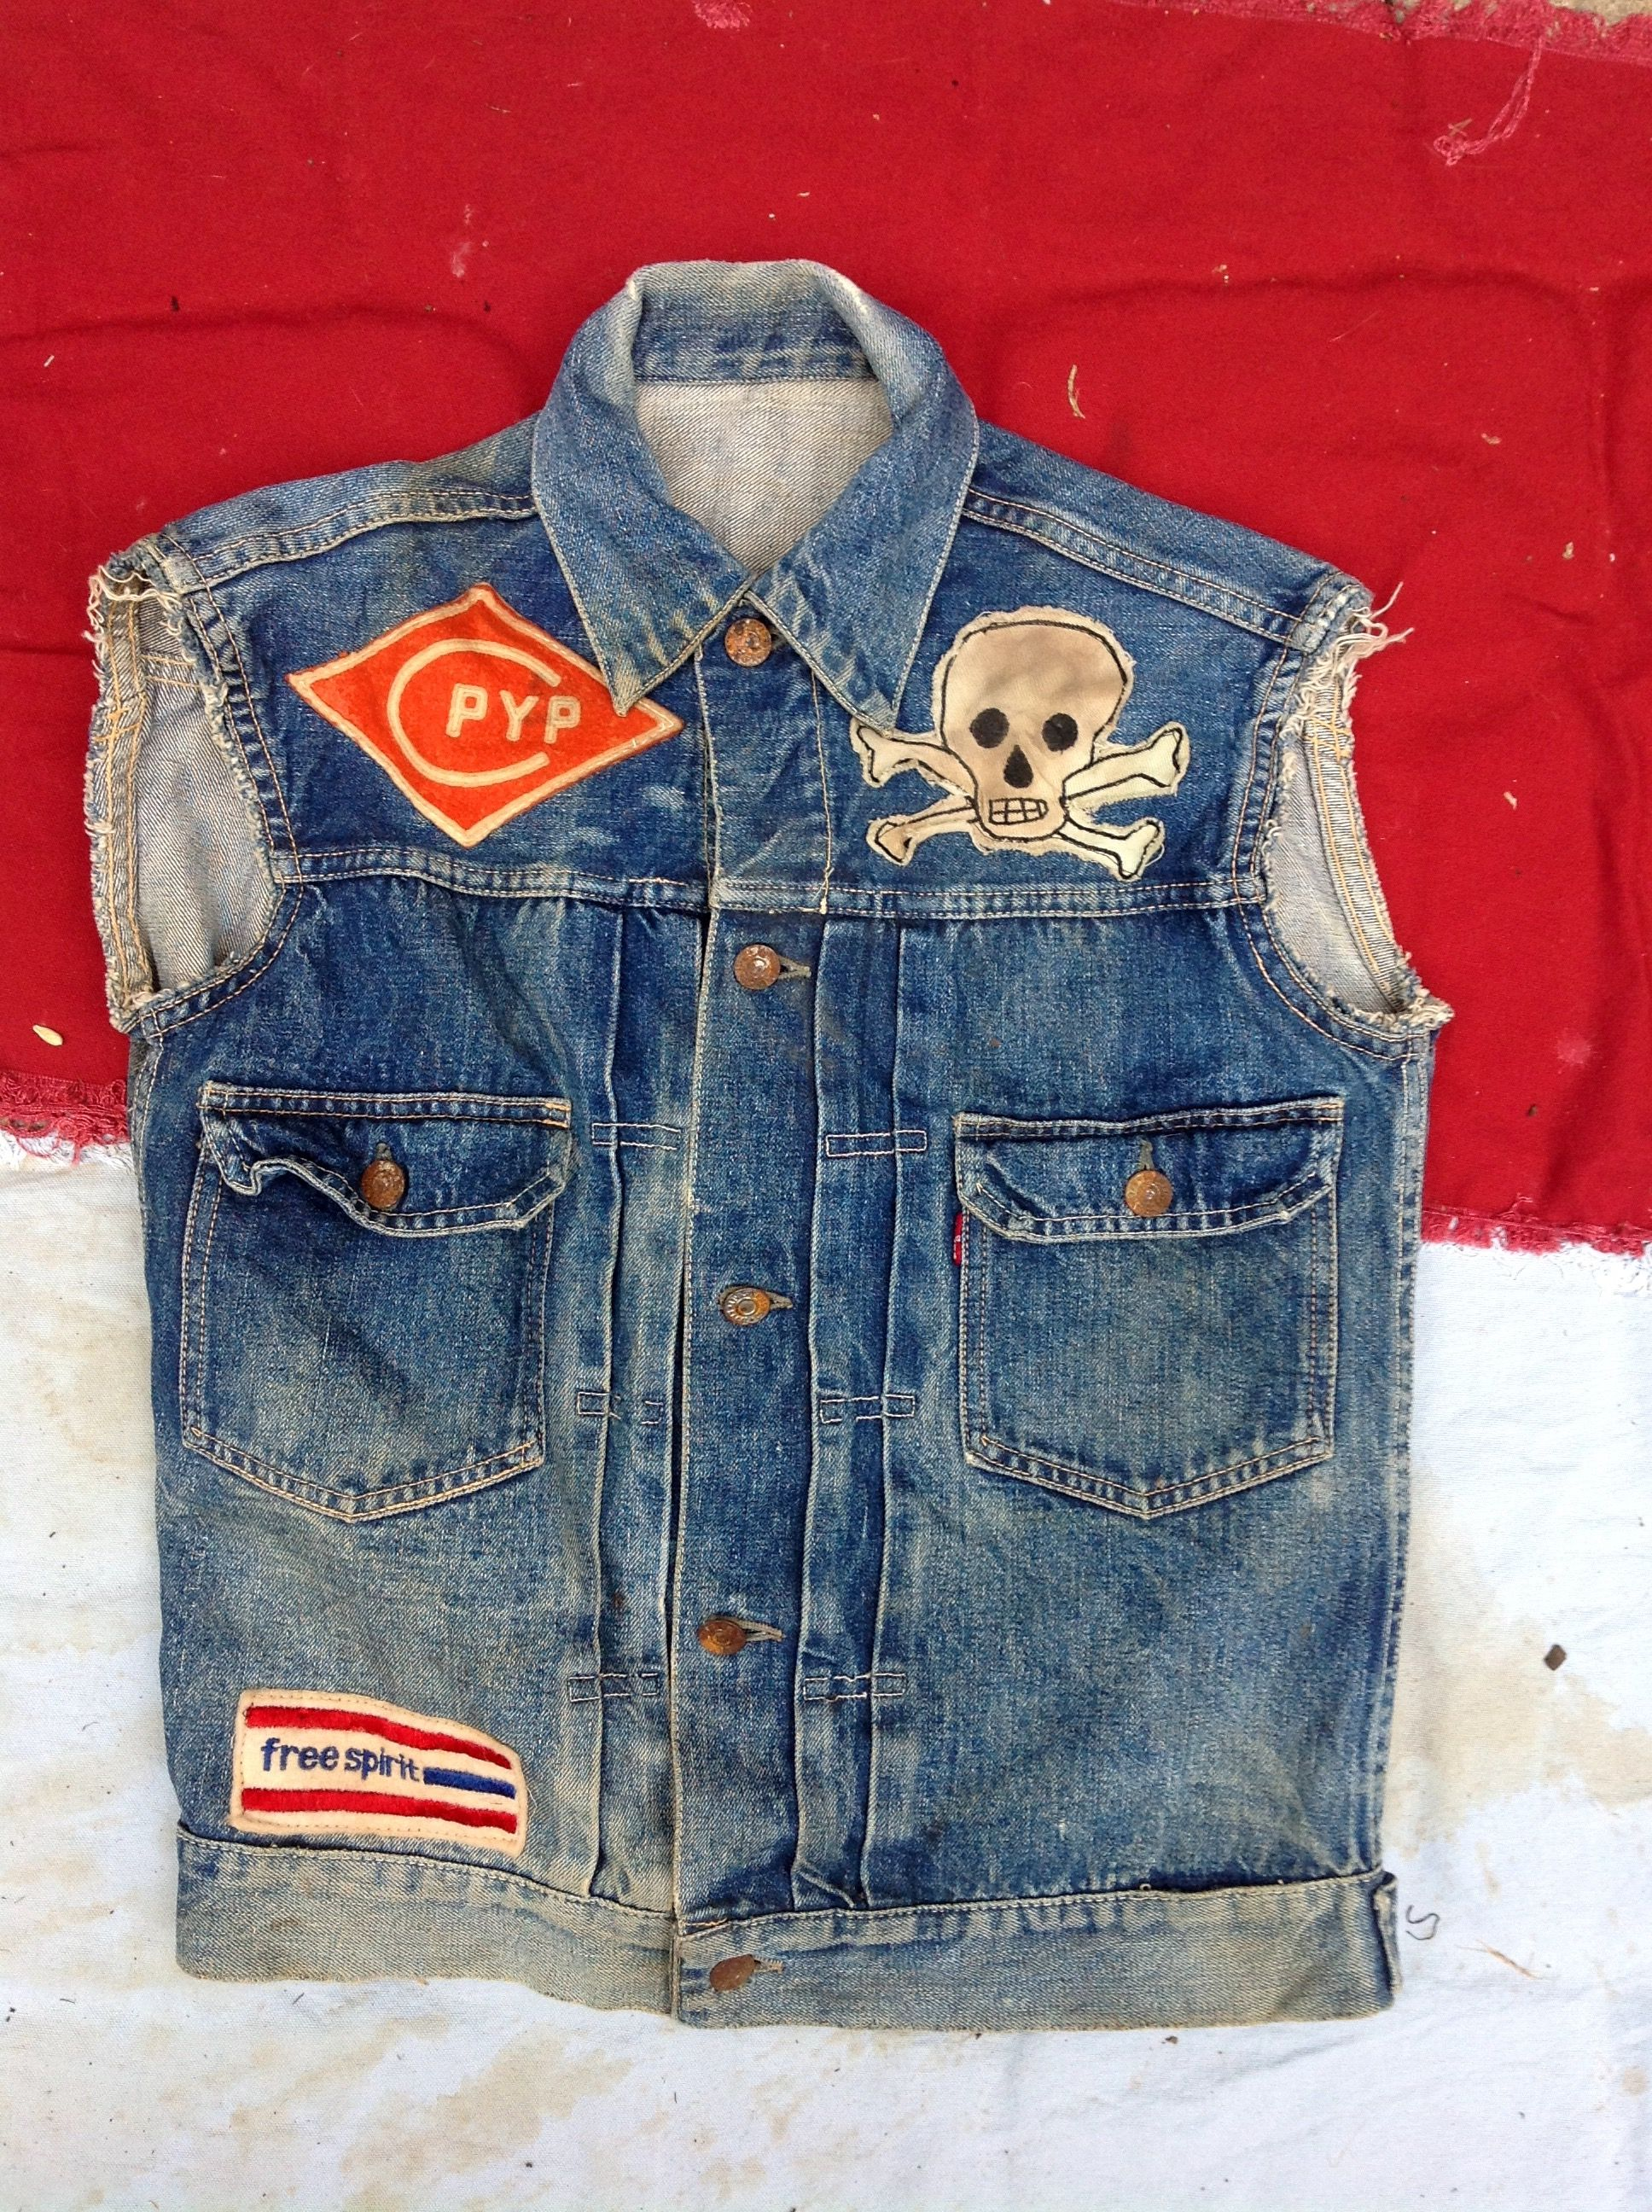 Pin By John Hefferon On Vintage Motorcycle Club Retro Outfits Biker Denim Motorcycle Vest